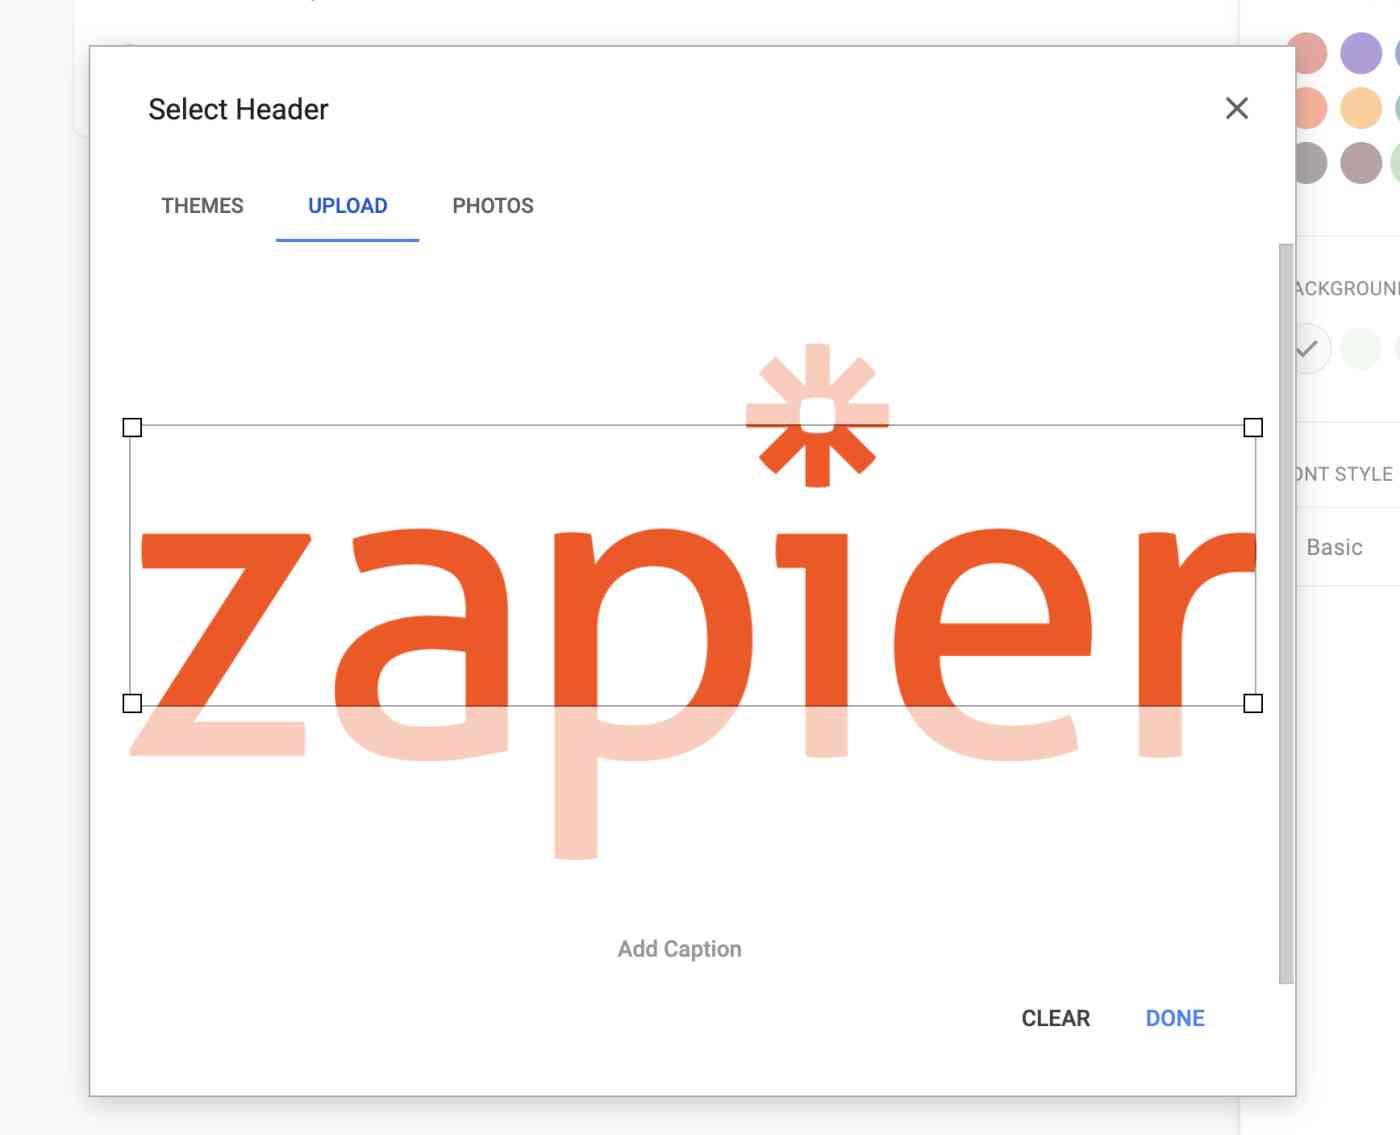 Zapier logo not fitting on Google forms header